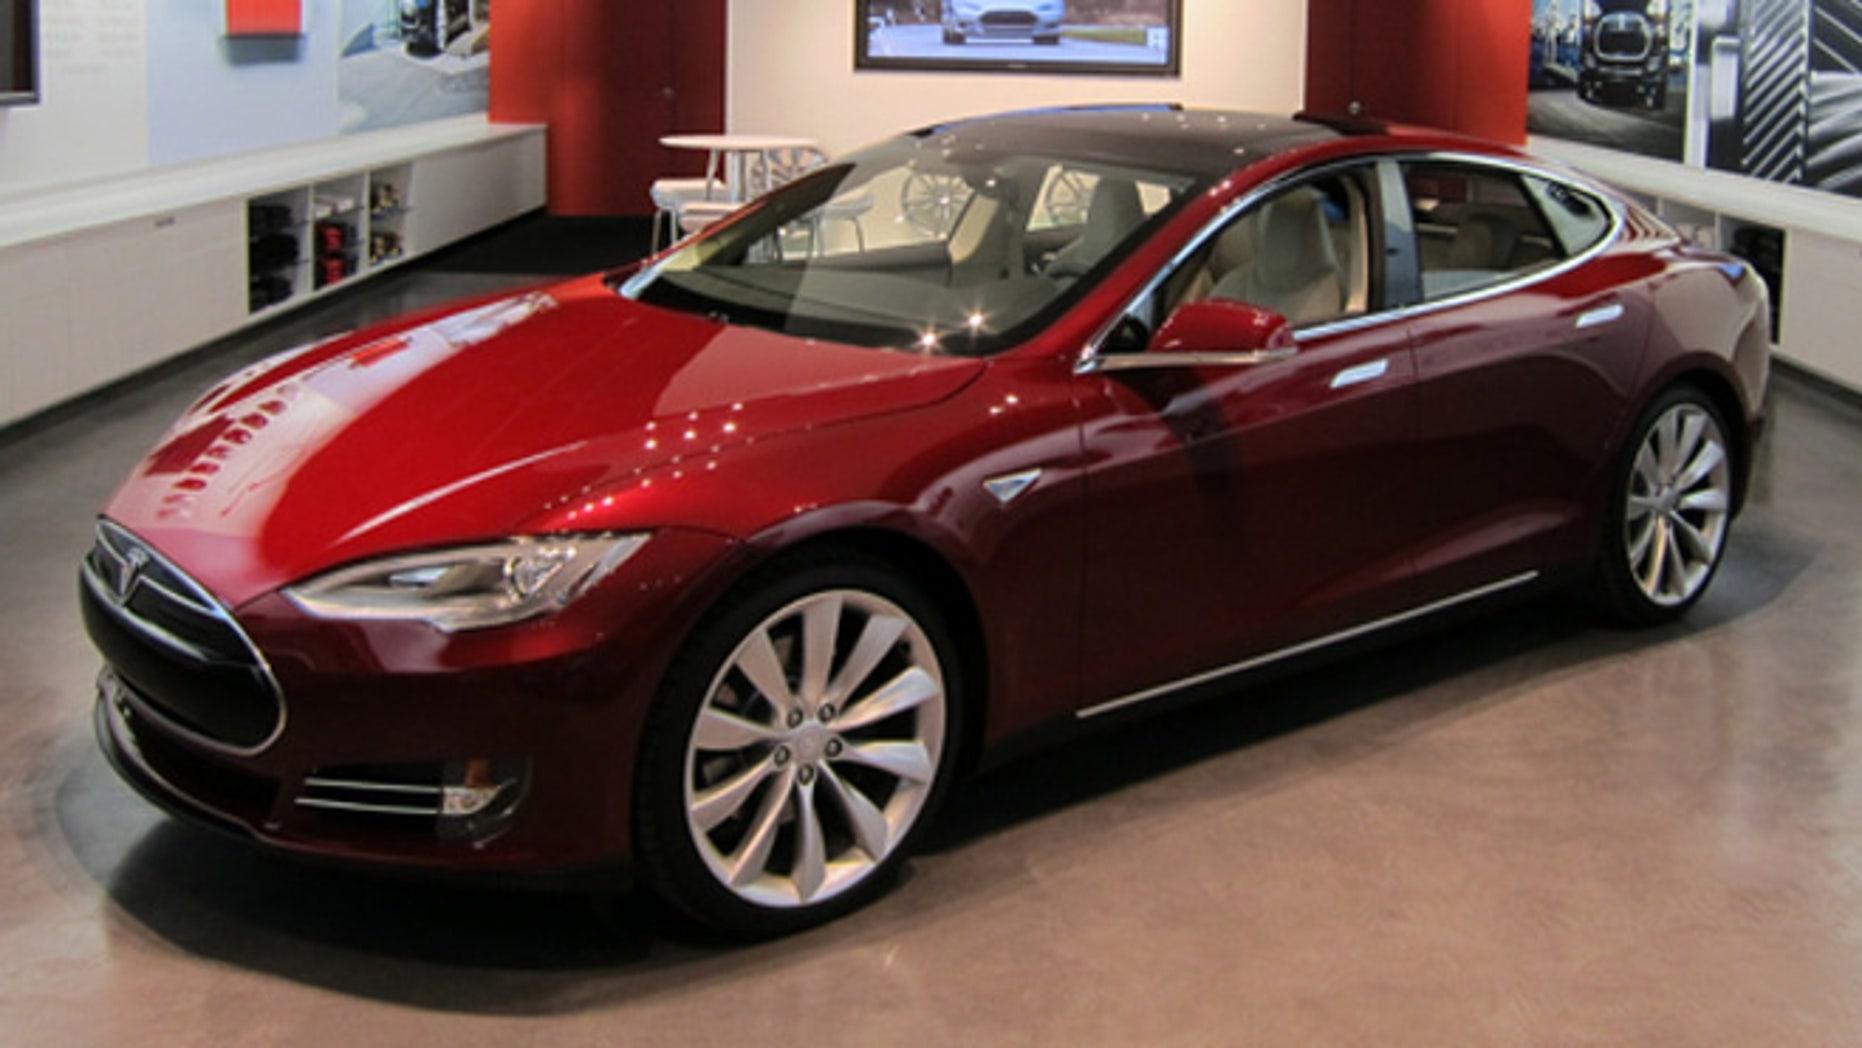 Tesla Motors gallery in Houston Galleria, opened October 2011, with Model S on display